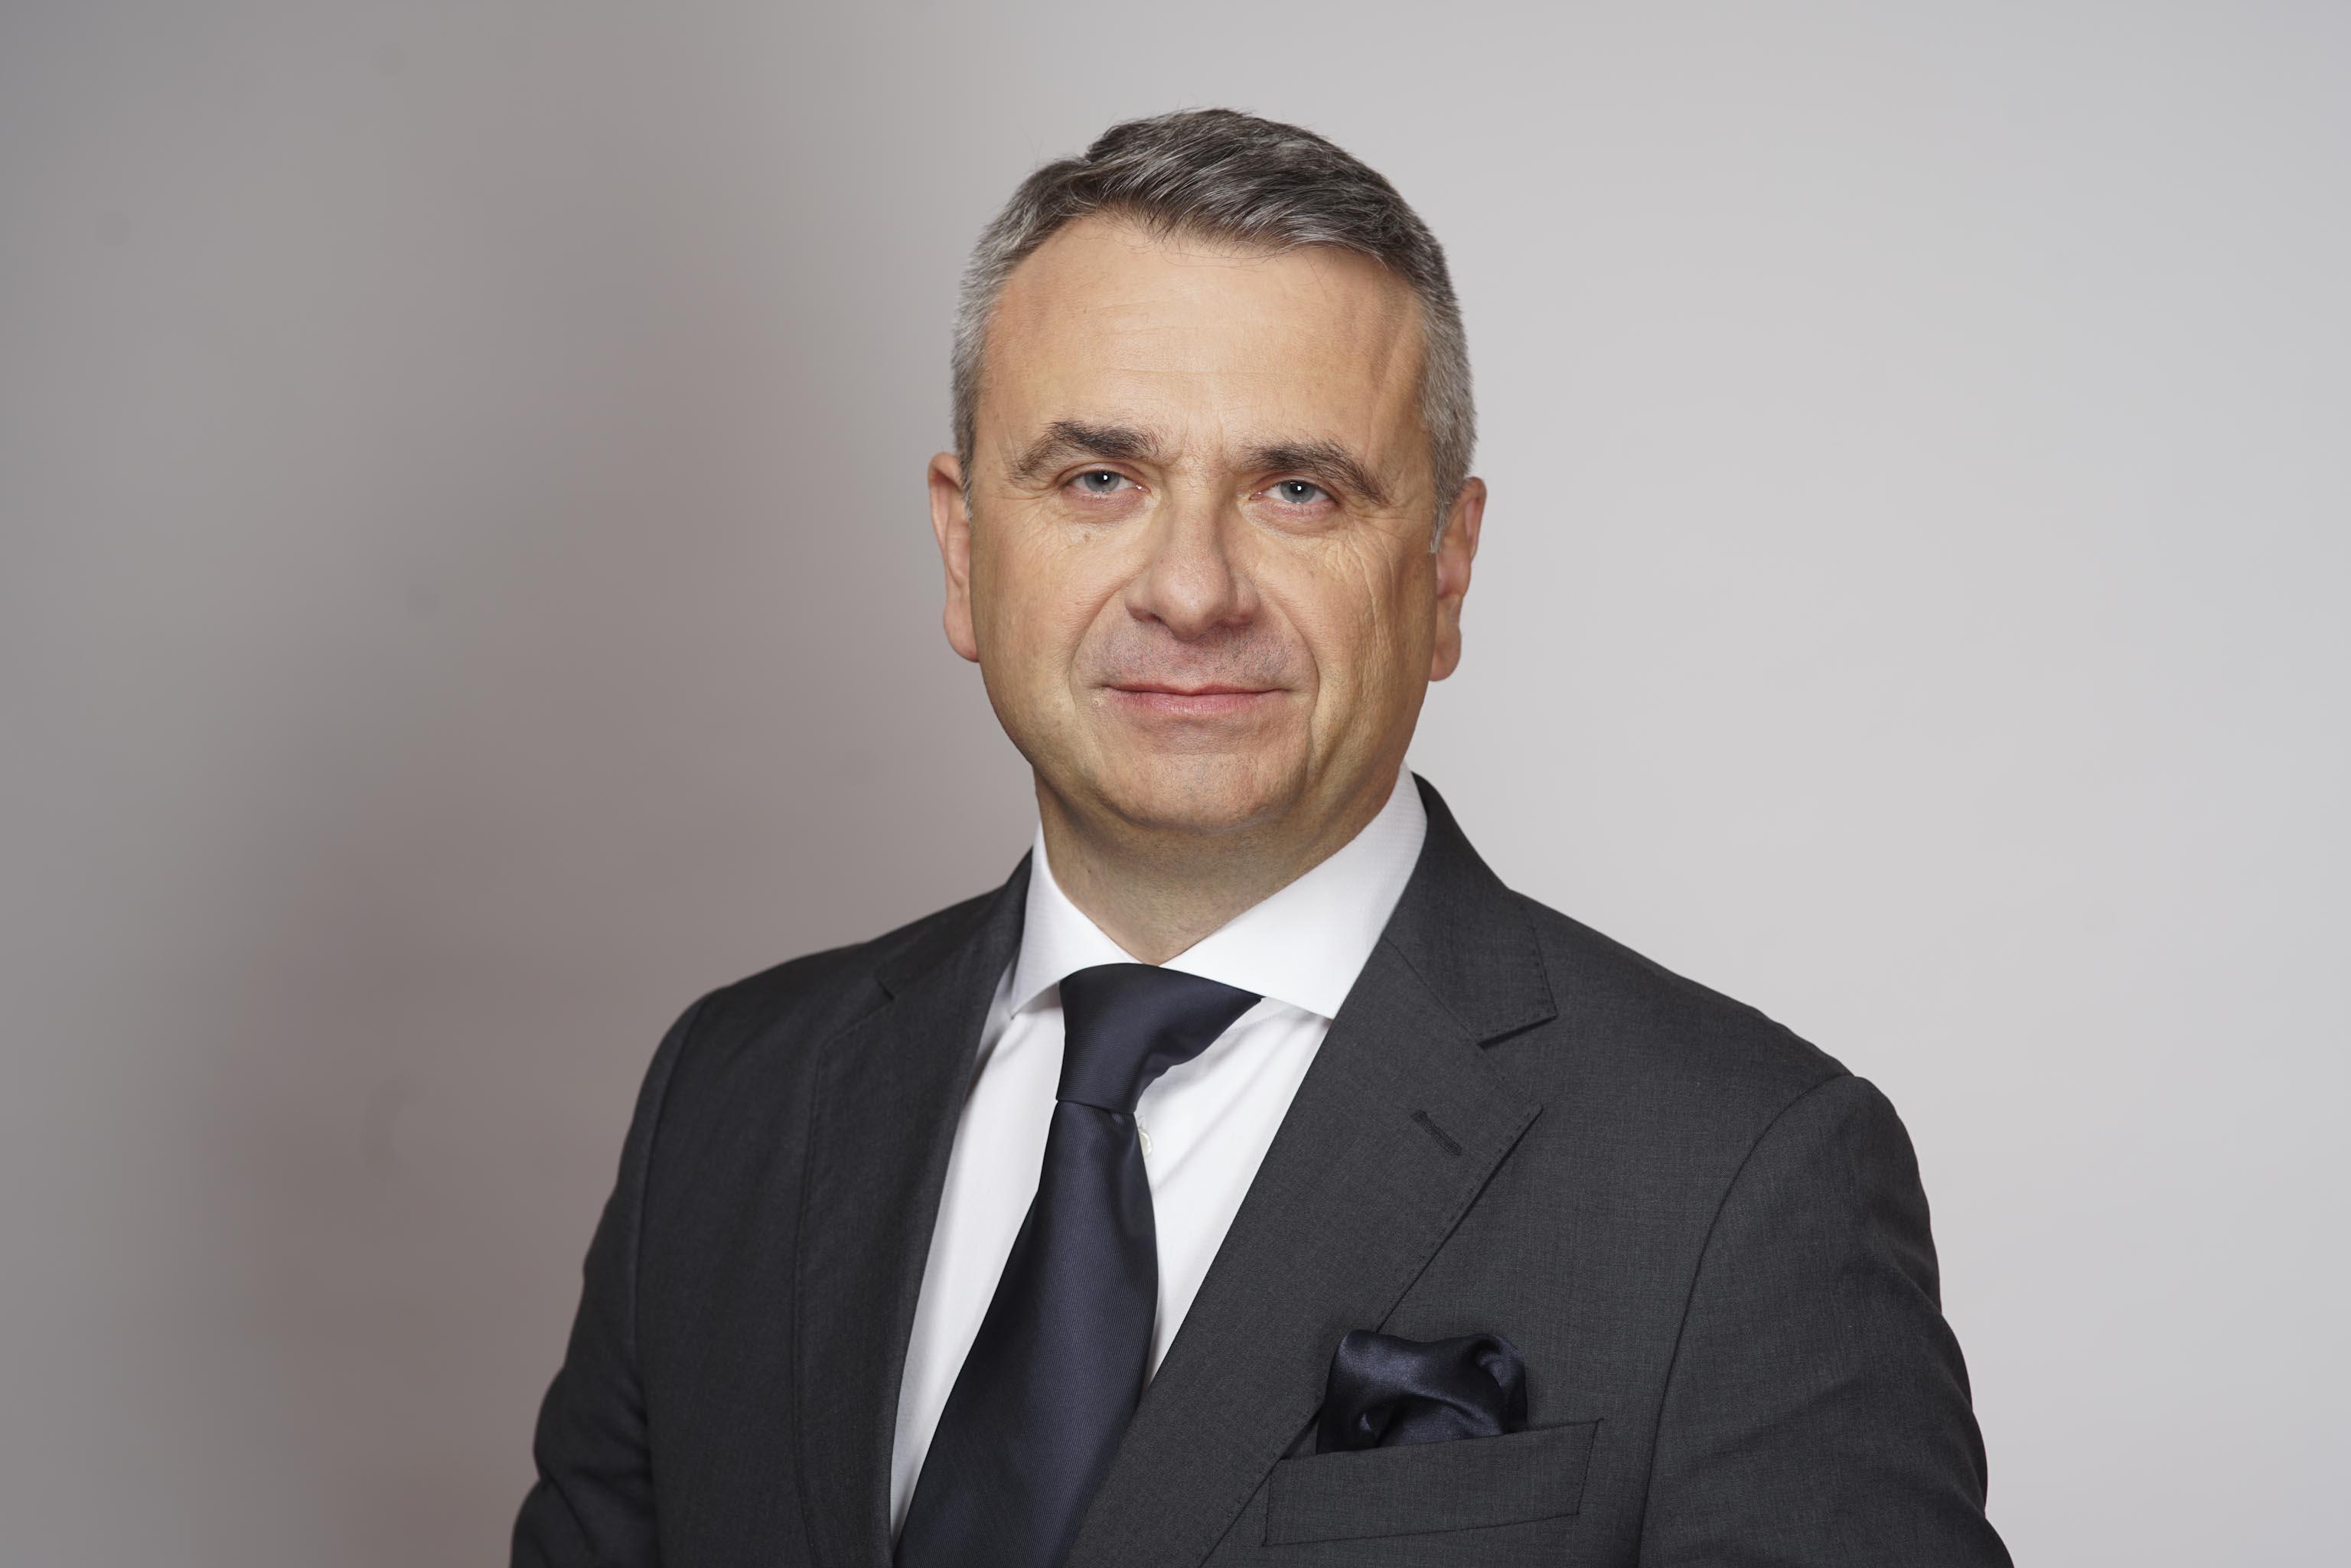 Robert Rękas Prezesem Lewiatan Holding S.A.